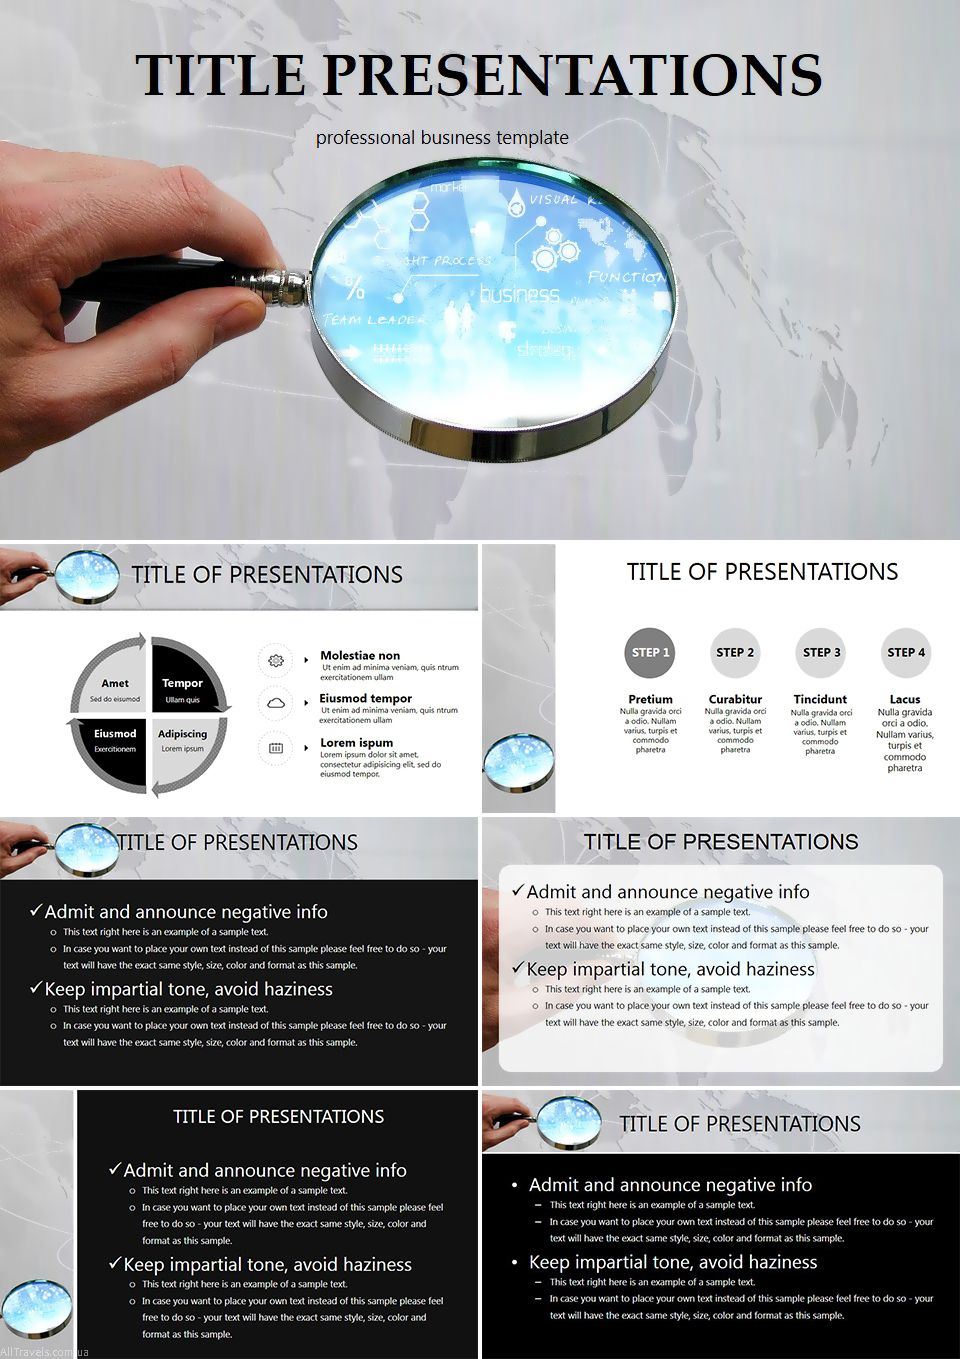 Search market sales powerpoint templates powerpoint templates search market sales powerpoint templates toneelgroepblik Image collections